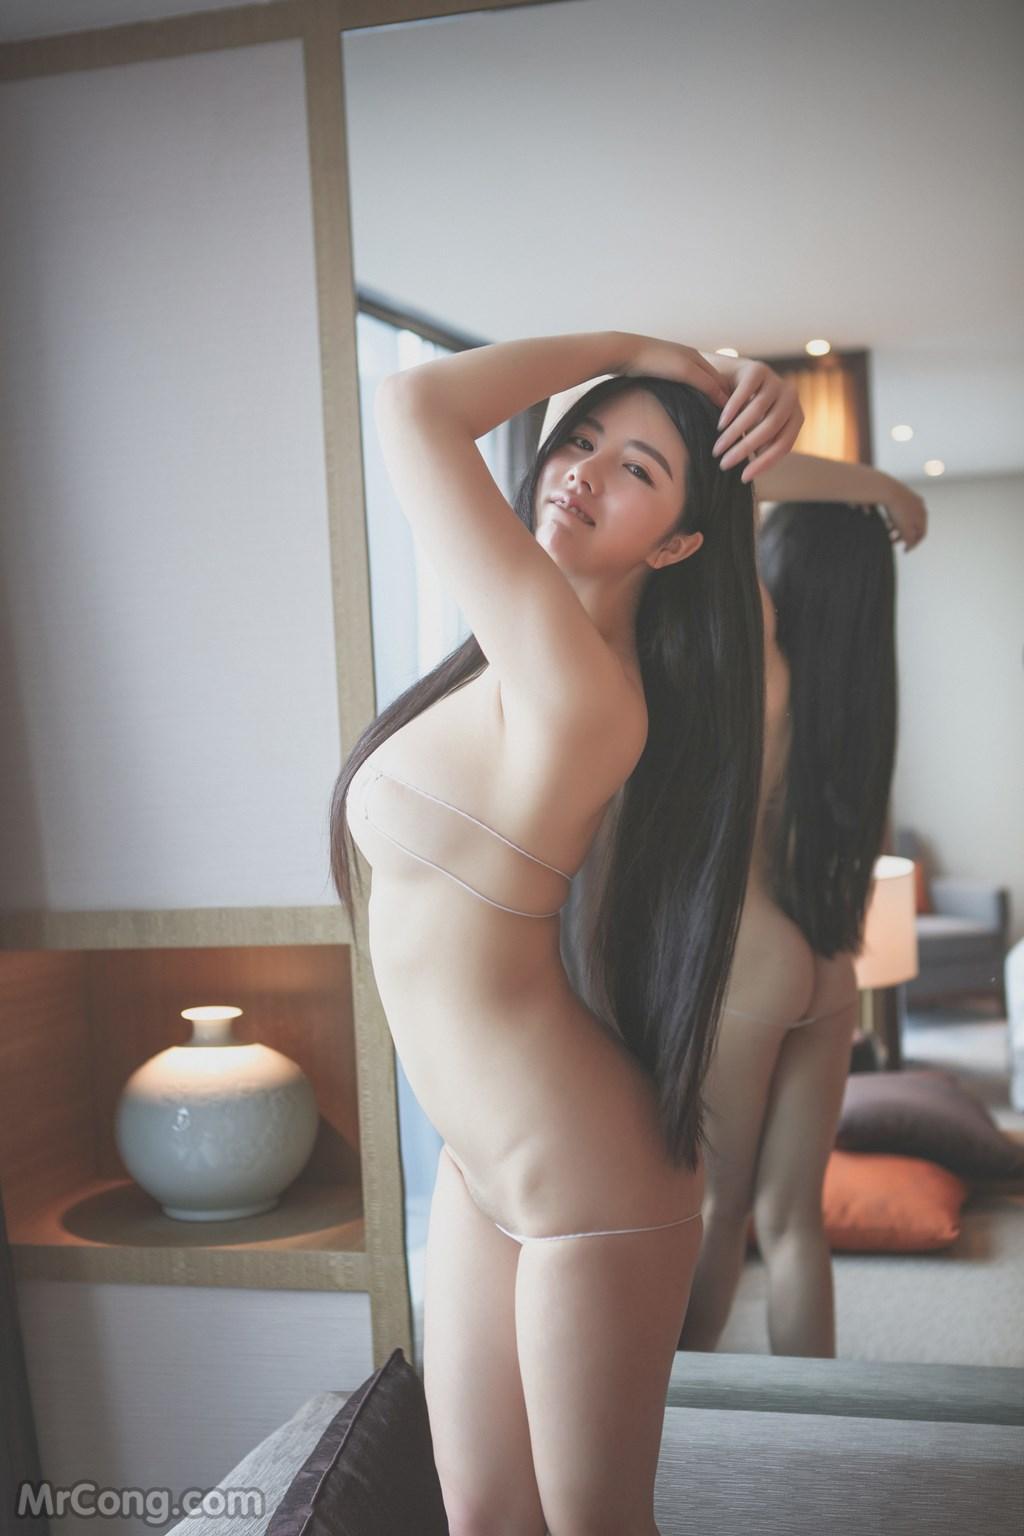 Image BoLoli-2017-06-06-Vol.066-Selena-Na-Lu-MrCong.com-015 in post BoLoli 2017-06-06 Vol.066: Người mẫu Selena (娜露) (35 ảnh)